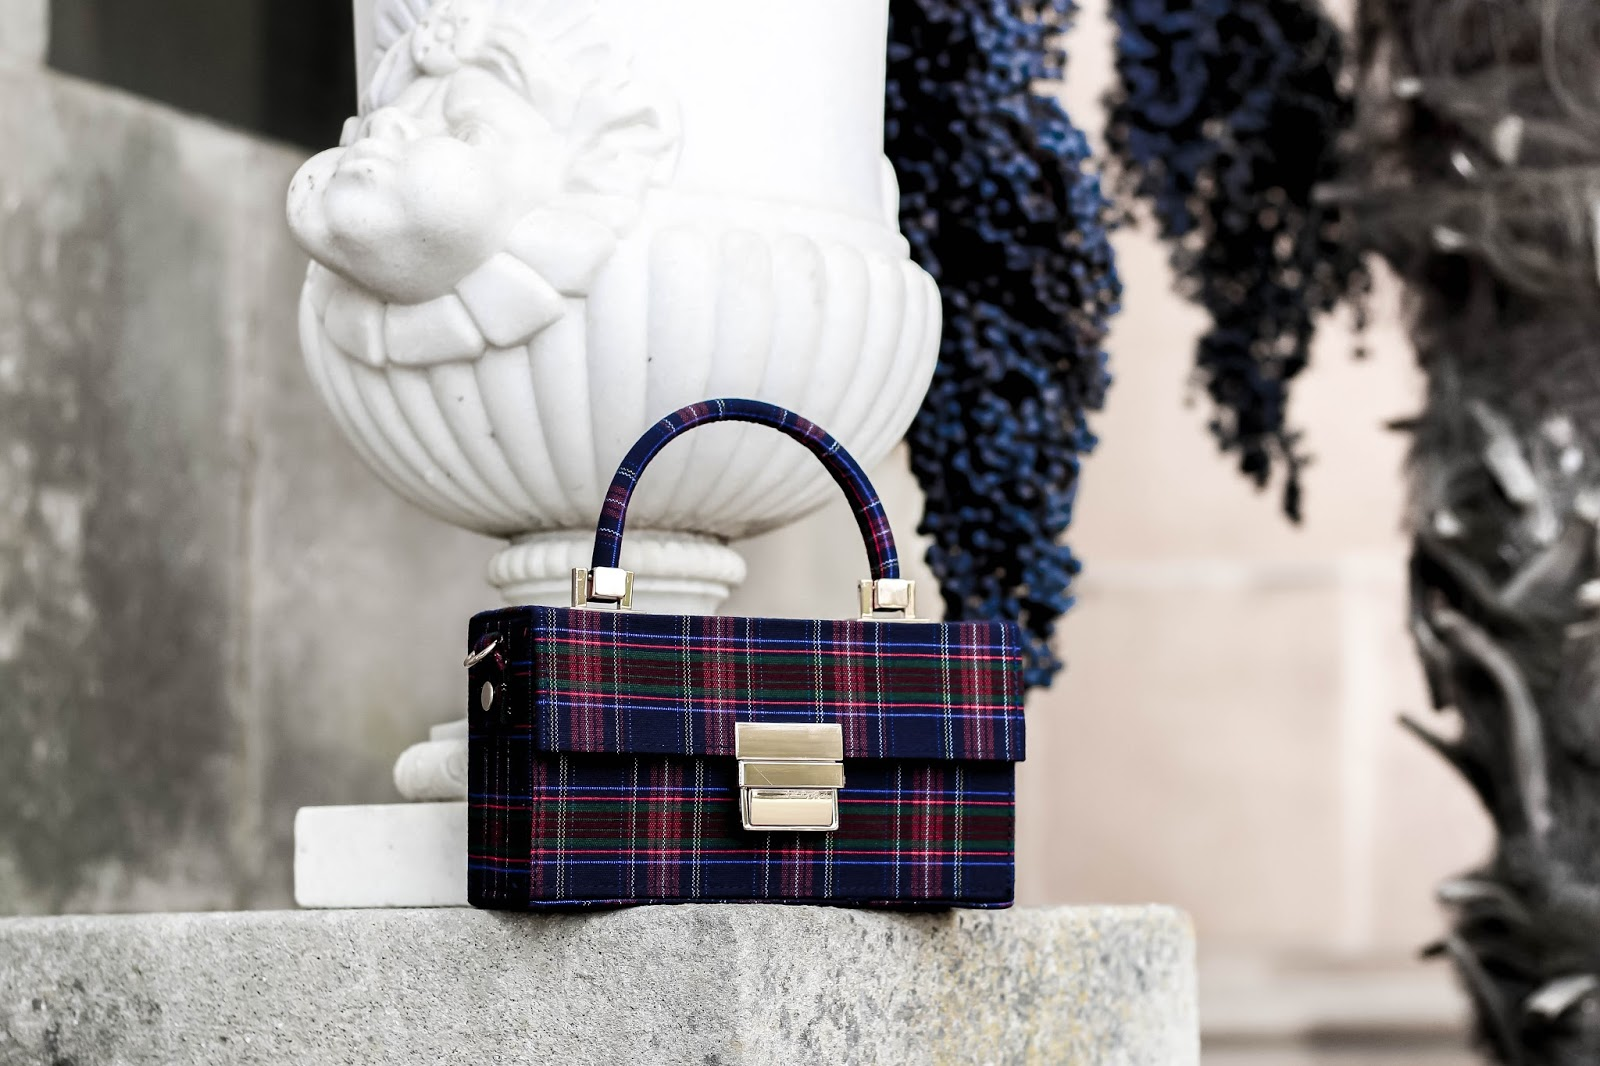 The Minaudière Bag Trend High Street Options